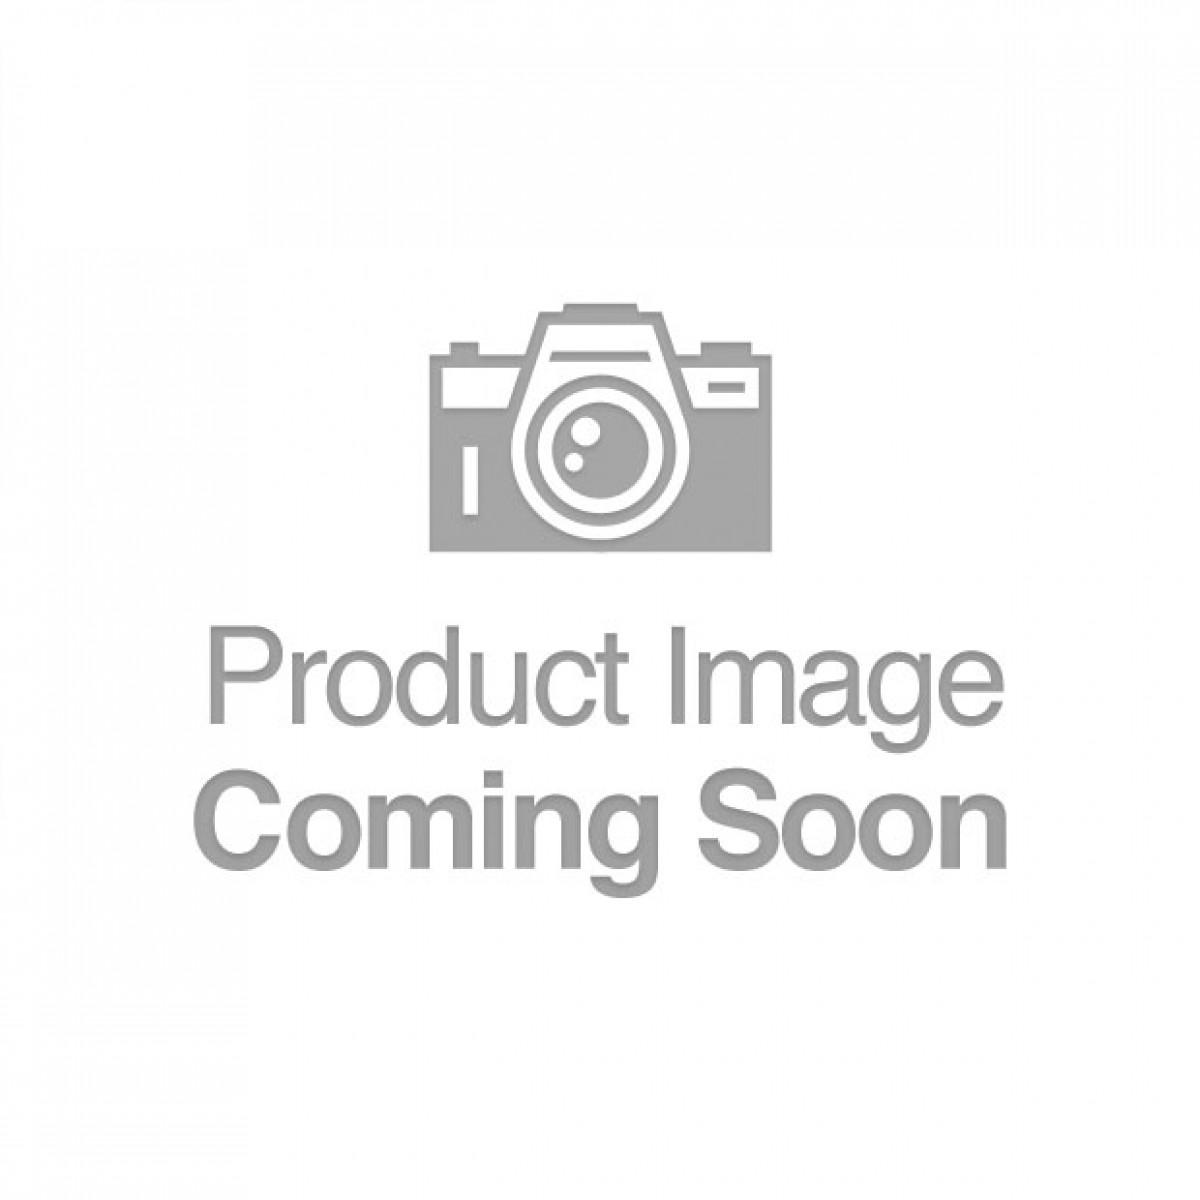 Dorcel Secret Clit Dual Stim Heating and Voice Control - Pink